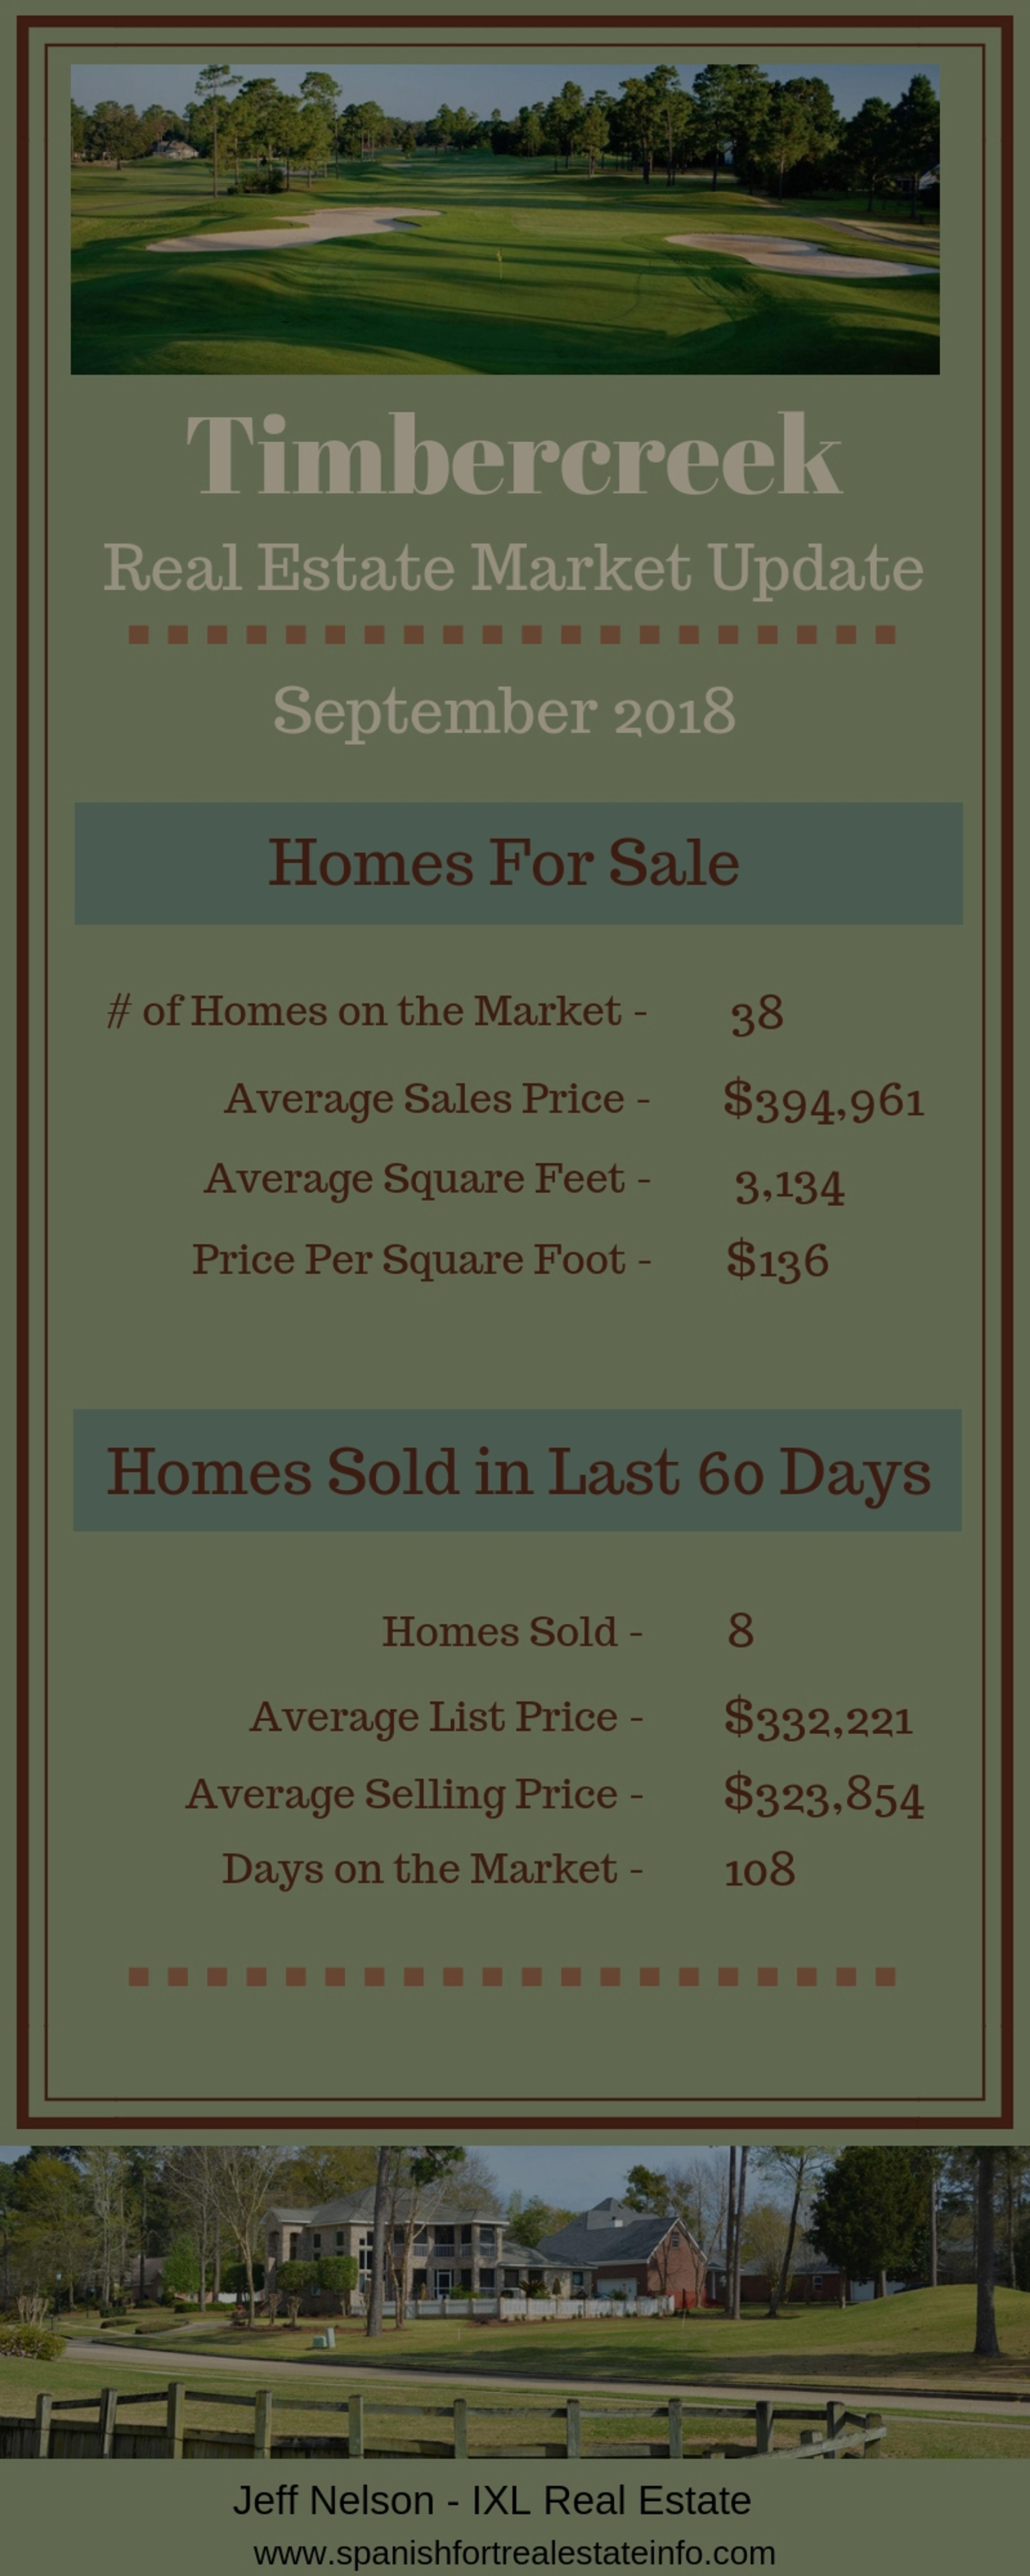 Timbercreek Real Estate Market Update – Sept 2018